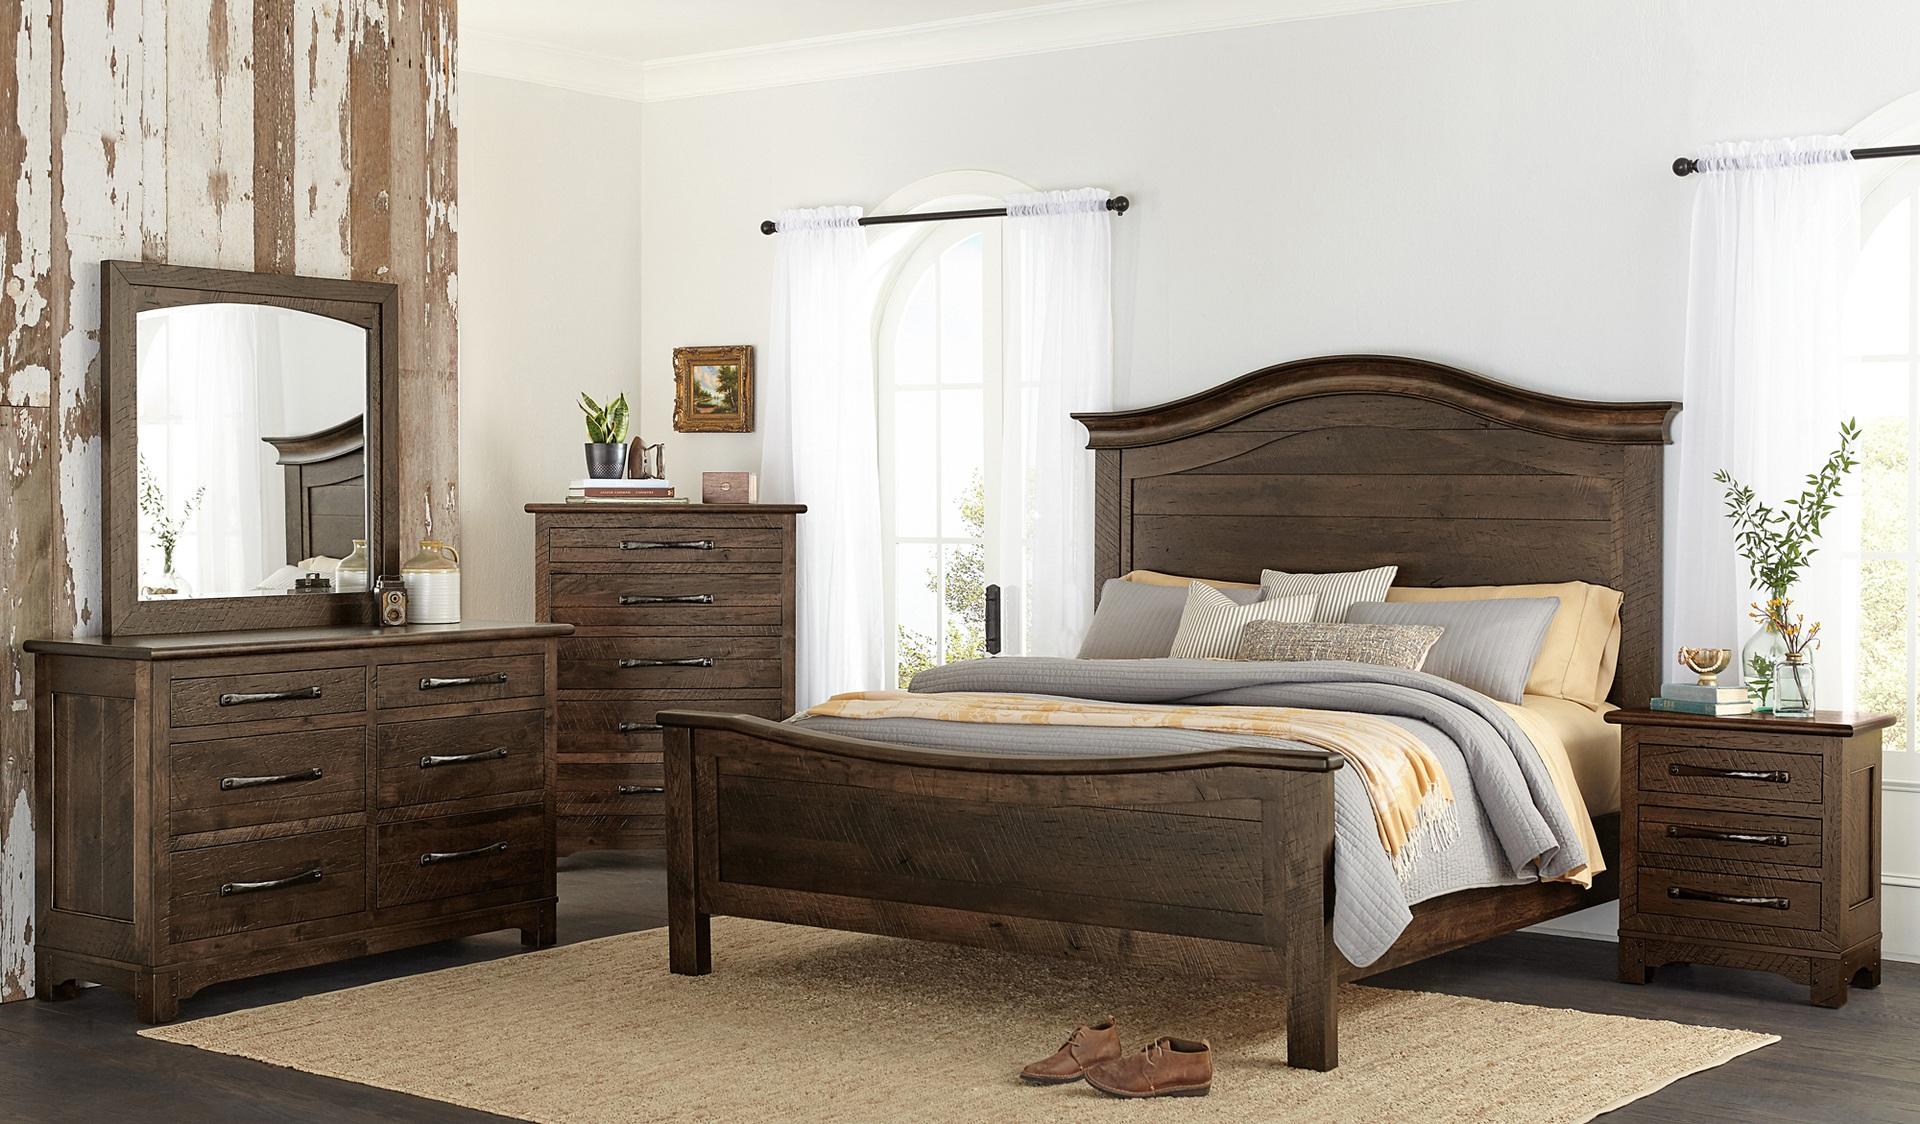 Custom Farmhouse Signature Bedroom Set